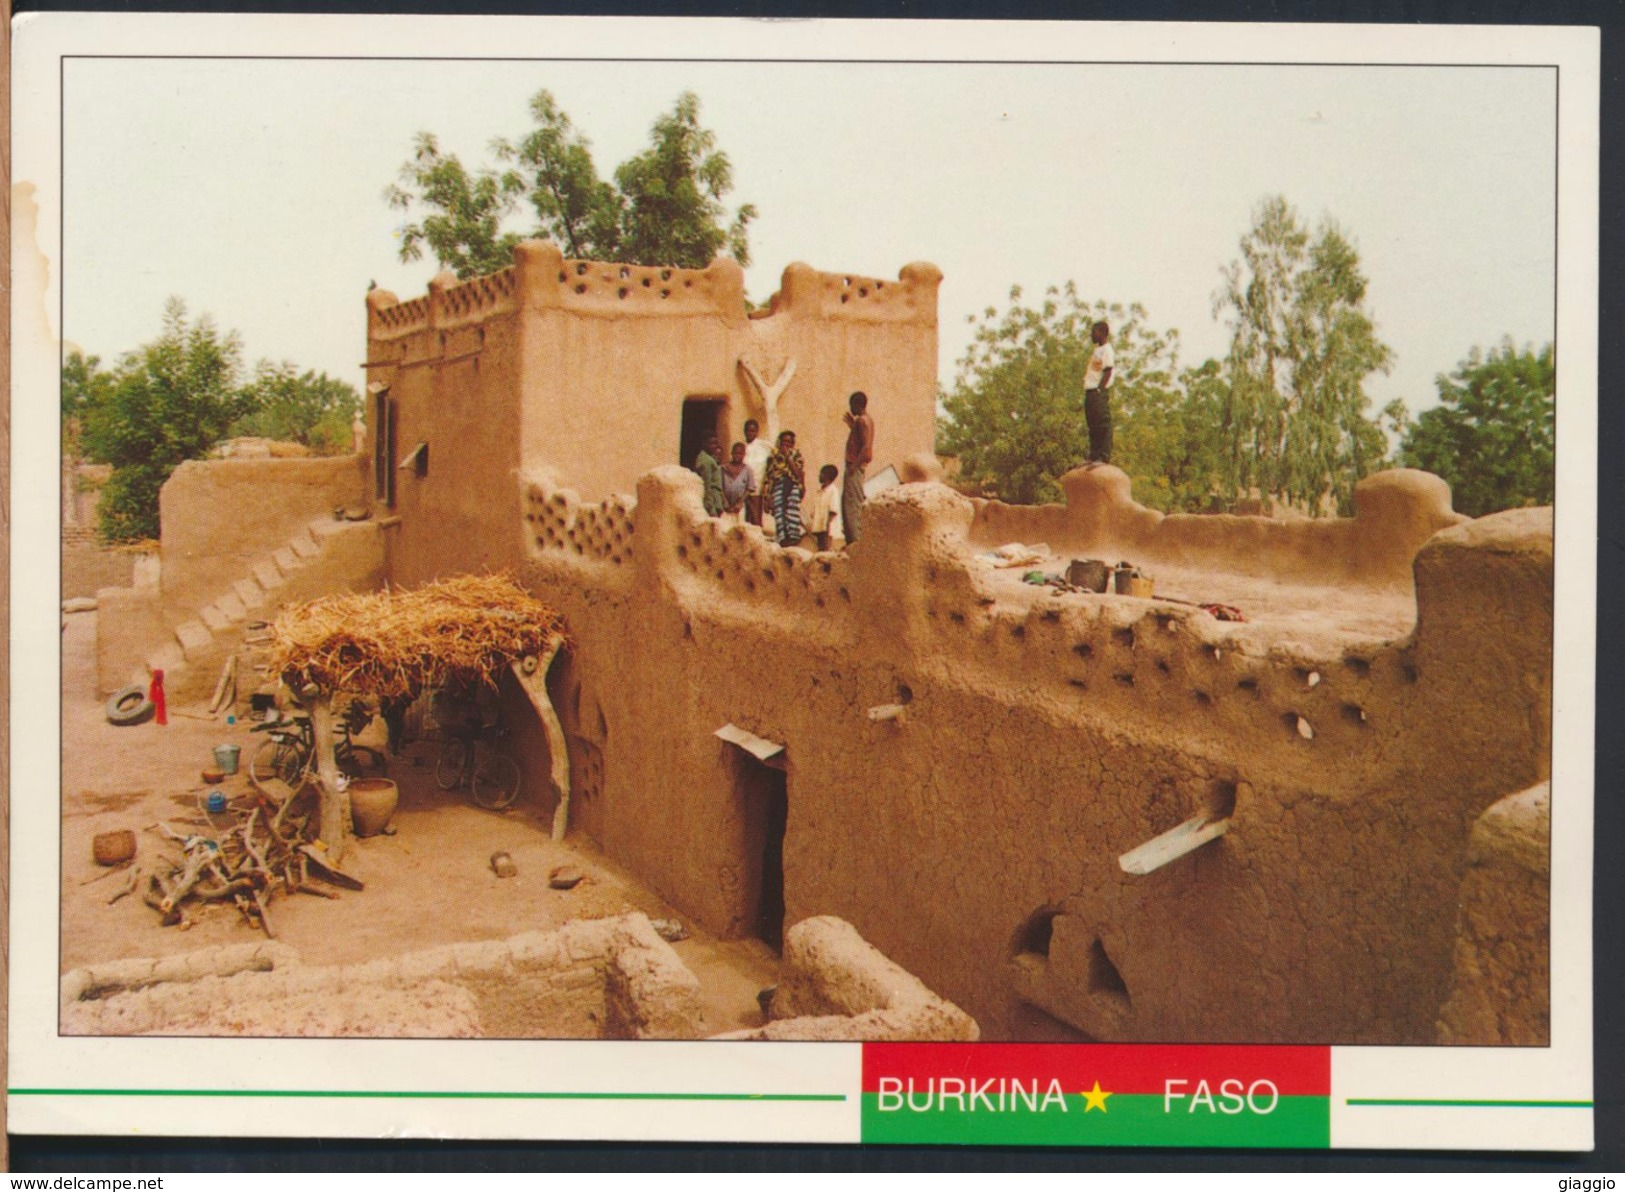 °°° 4288 - BURKINA FASO - KOSSI - MAISON D'HABITATION A NOUNA - With Stamps °°° - Burkina Faso